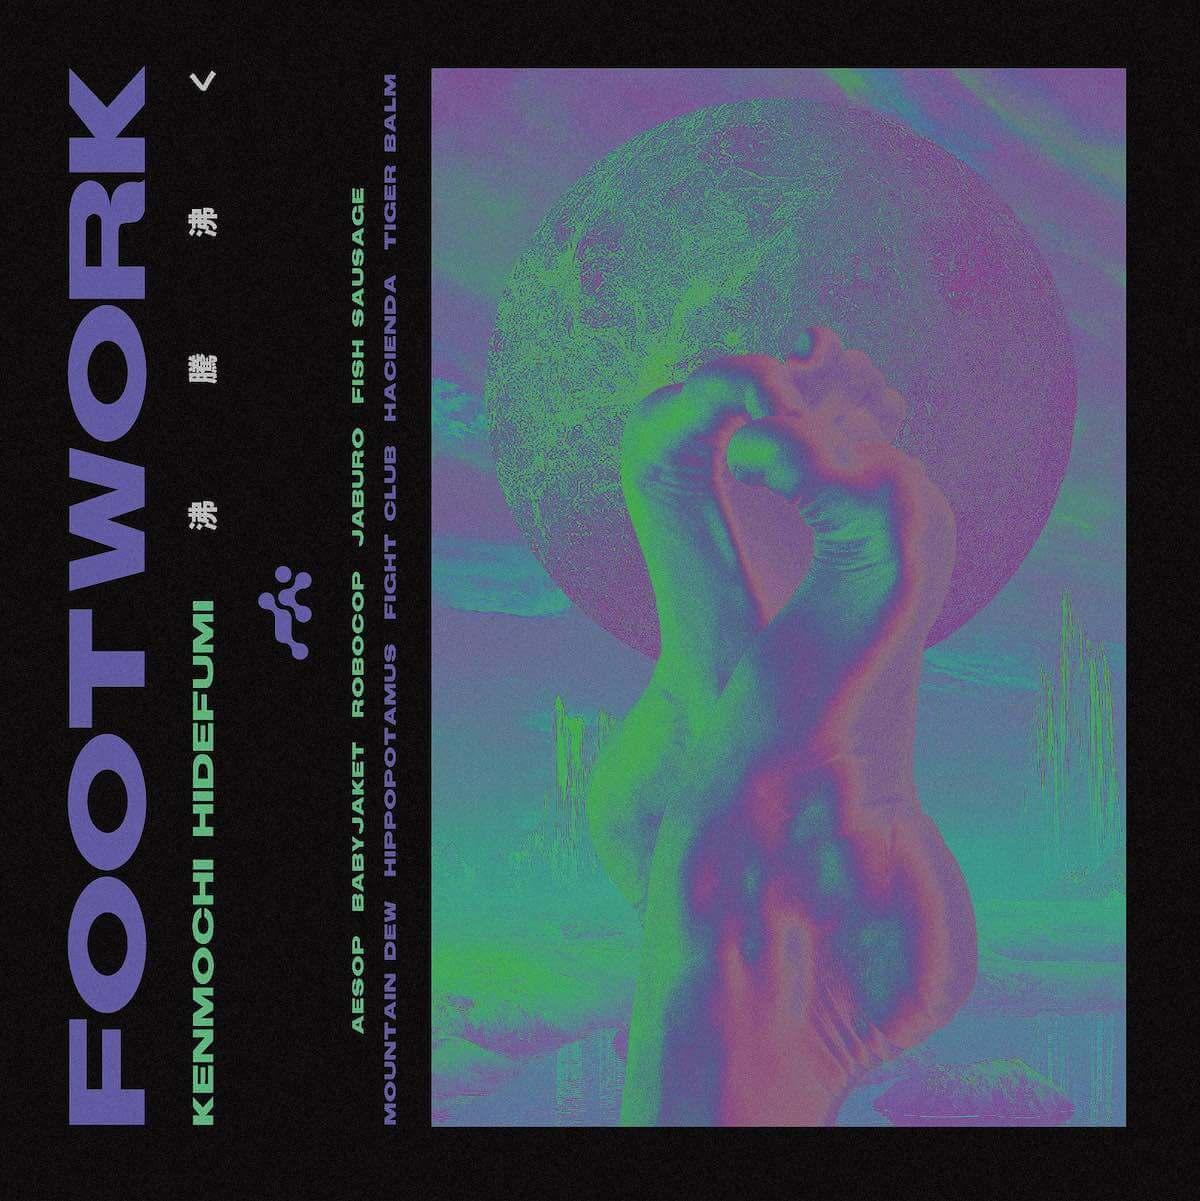 Kenmochi Hidefumi、『沸騰 沸く~FOOTWORK~』発売、MVも3本公開!イベントも開催! FW-H1_ss